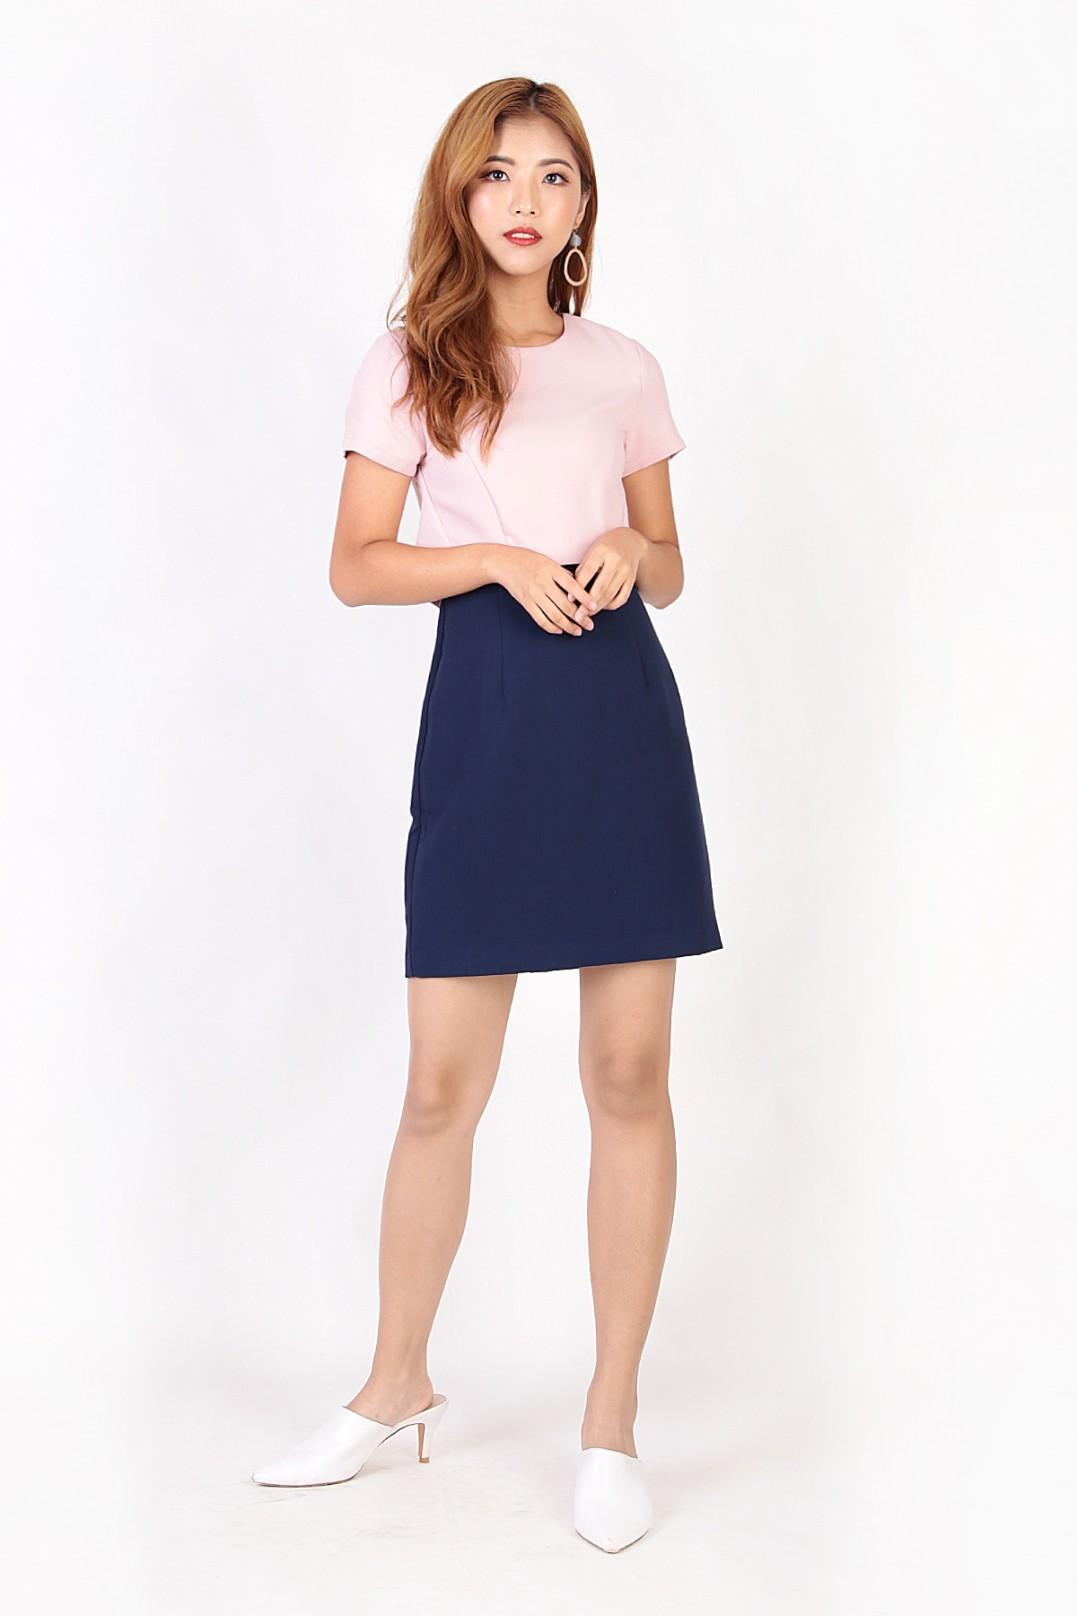 711995c313f RESTOCK  Jolaine Colorblock Dress in Pink - MGP